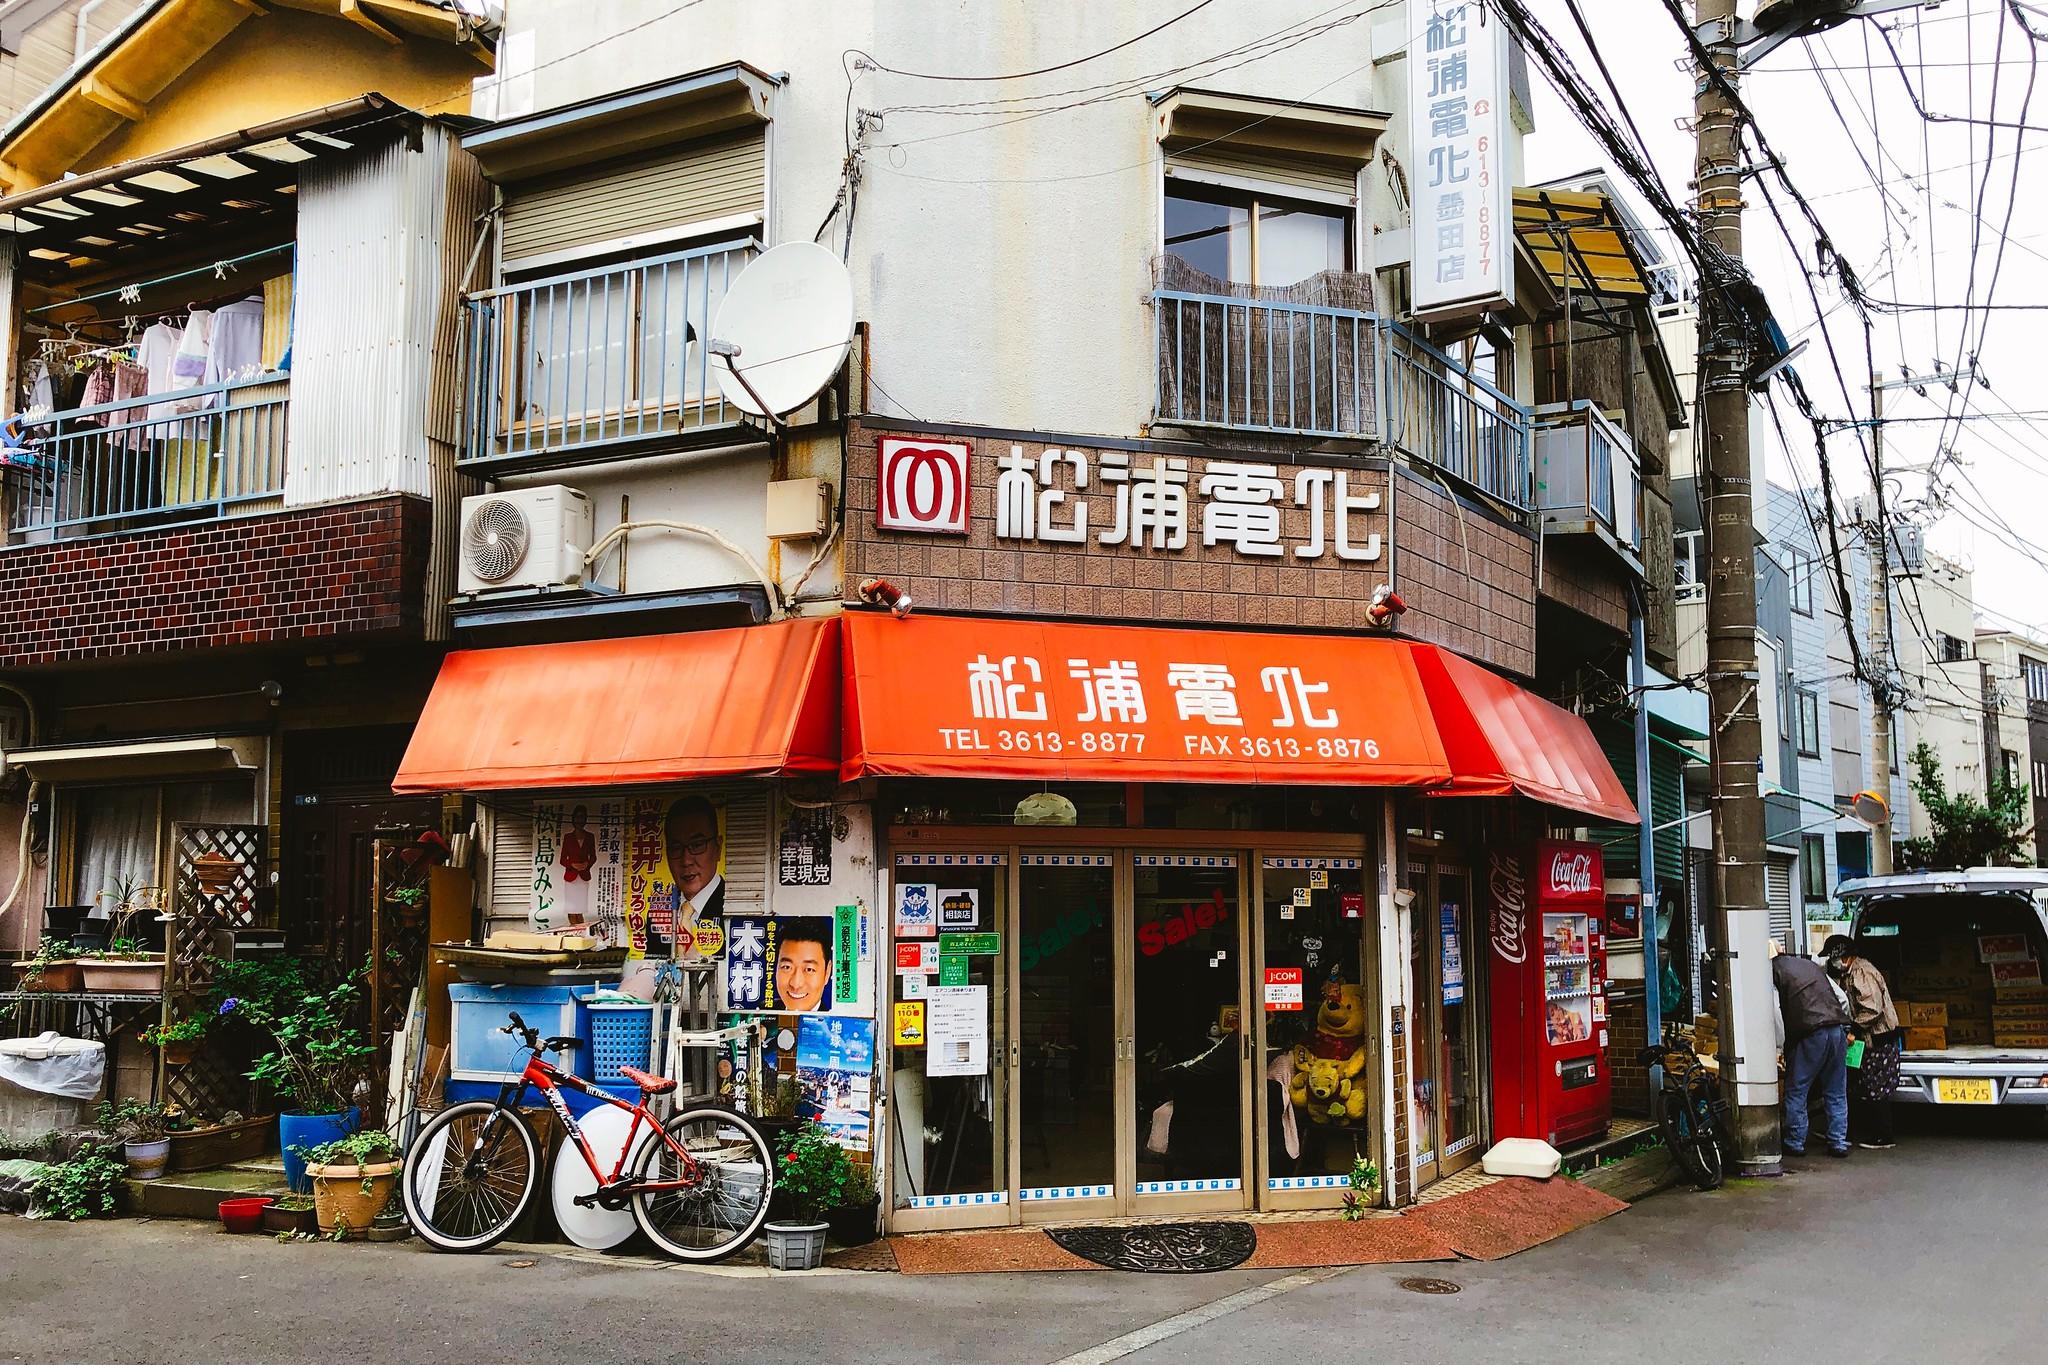 Tokyo Yahiro 2020 #iPhoneX #Halide #RNIFilms #Apple #Shotoniphone